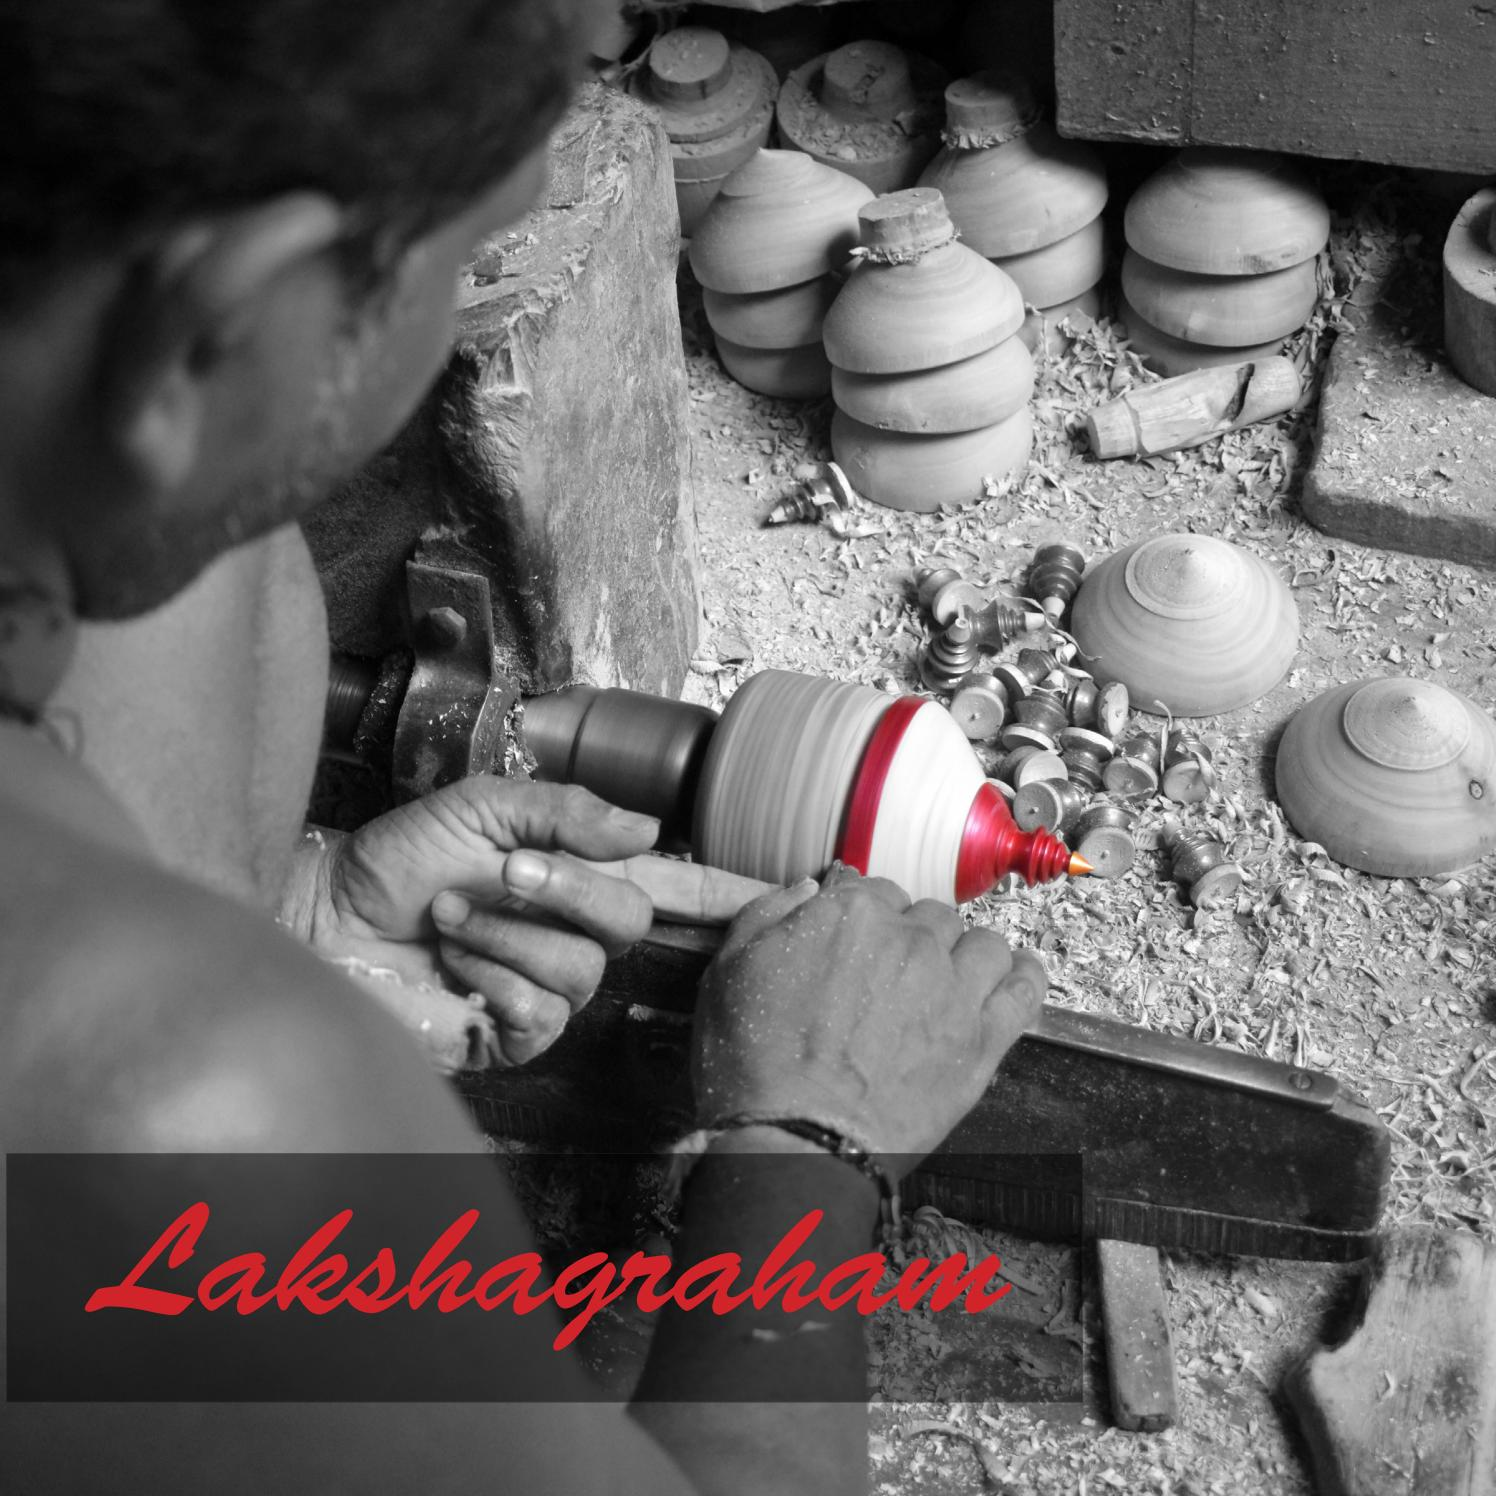 lakshagraham- lacquer toys , varanasinitin gupta - issuu